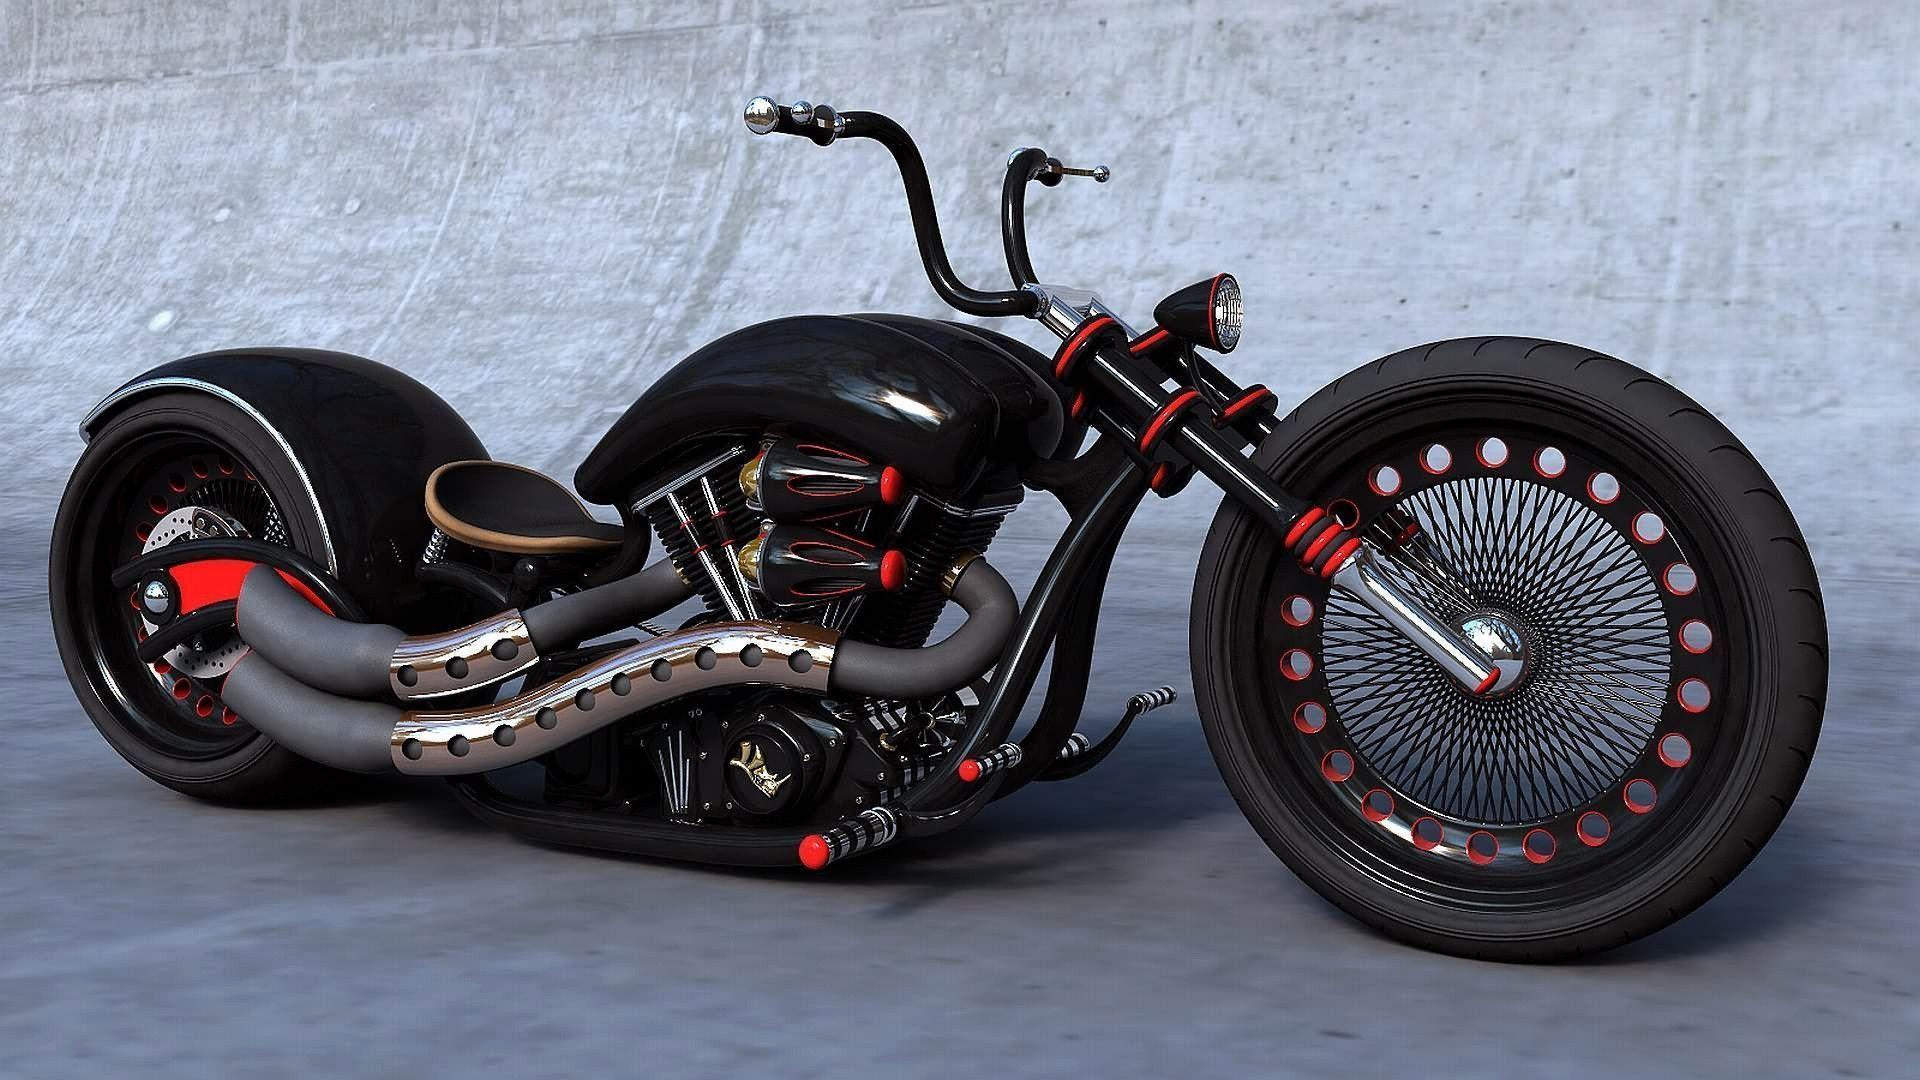 Black Custom Chopper Wallpapers Download Free Widescreen HD